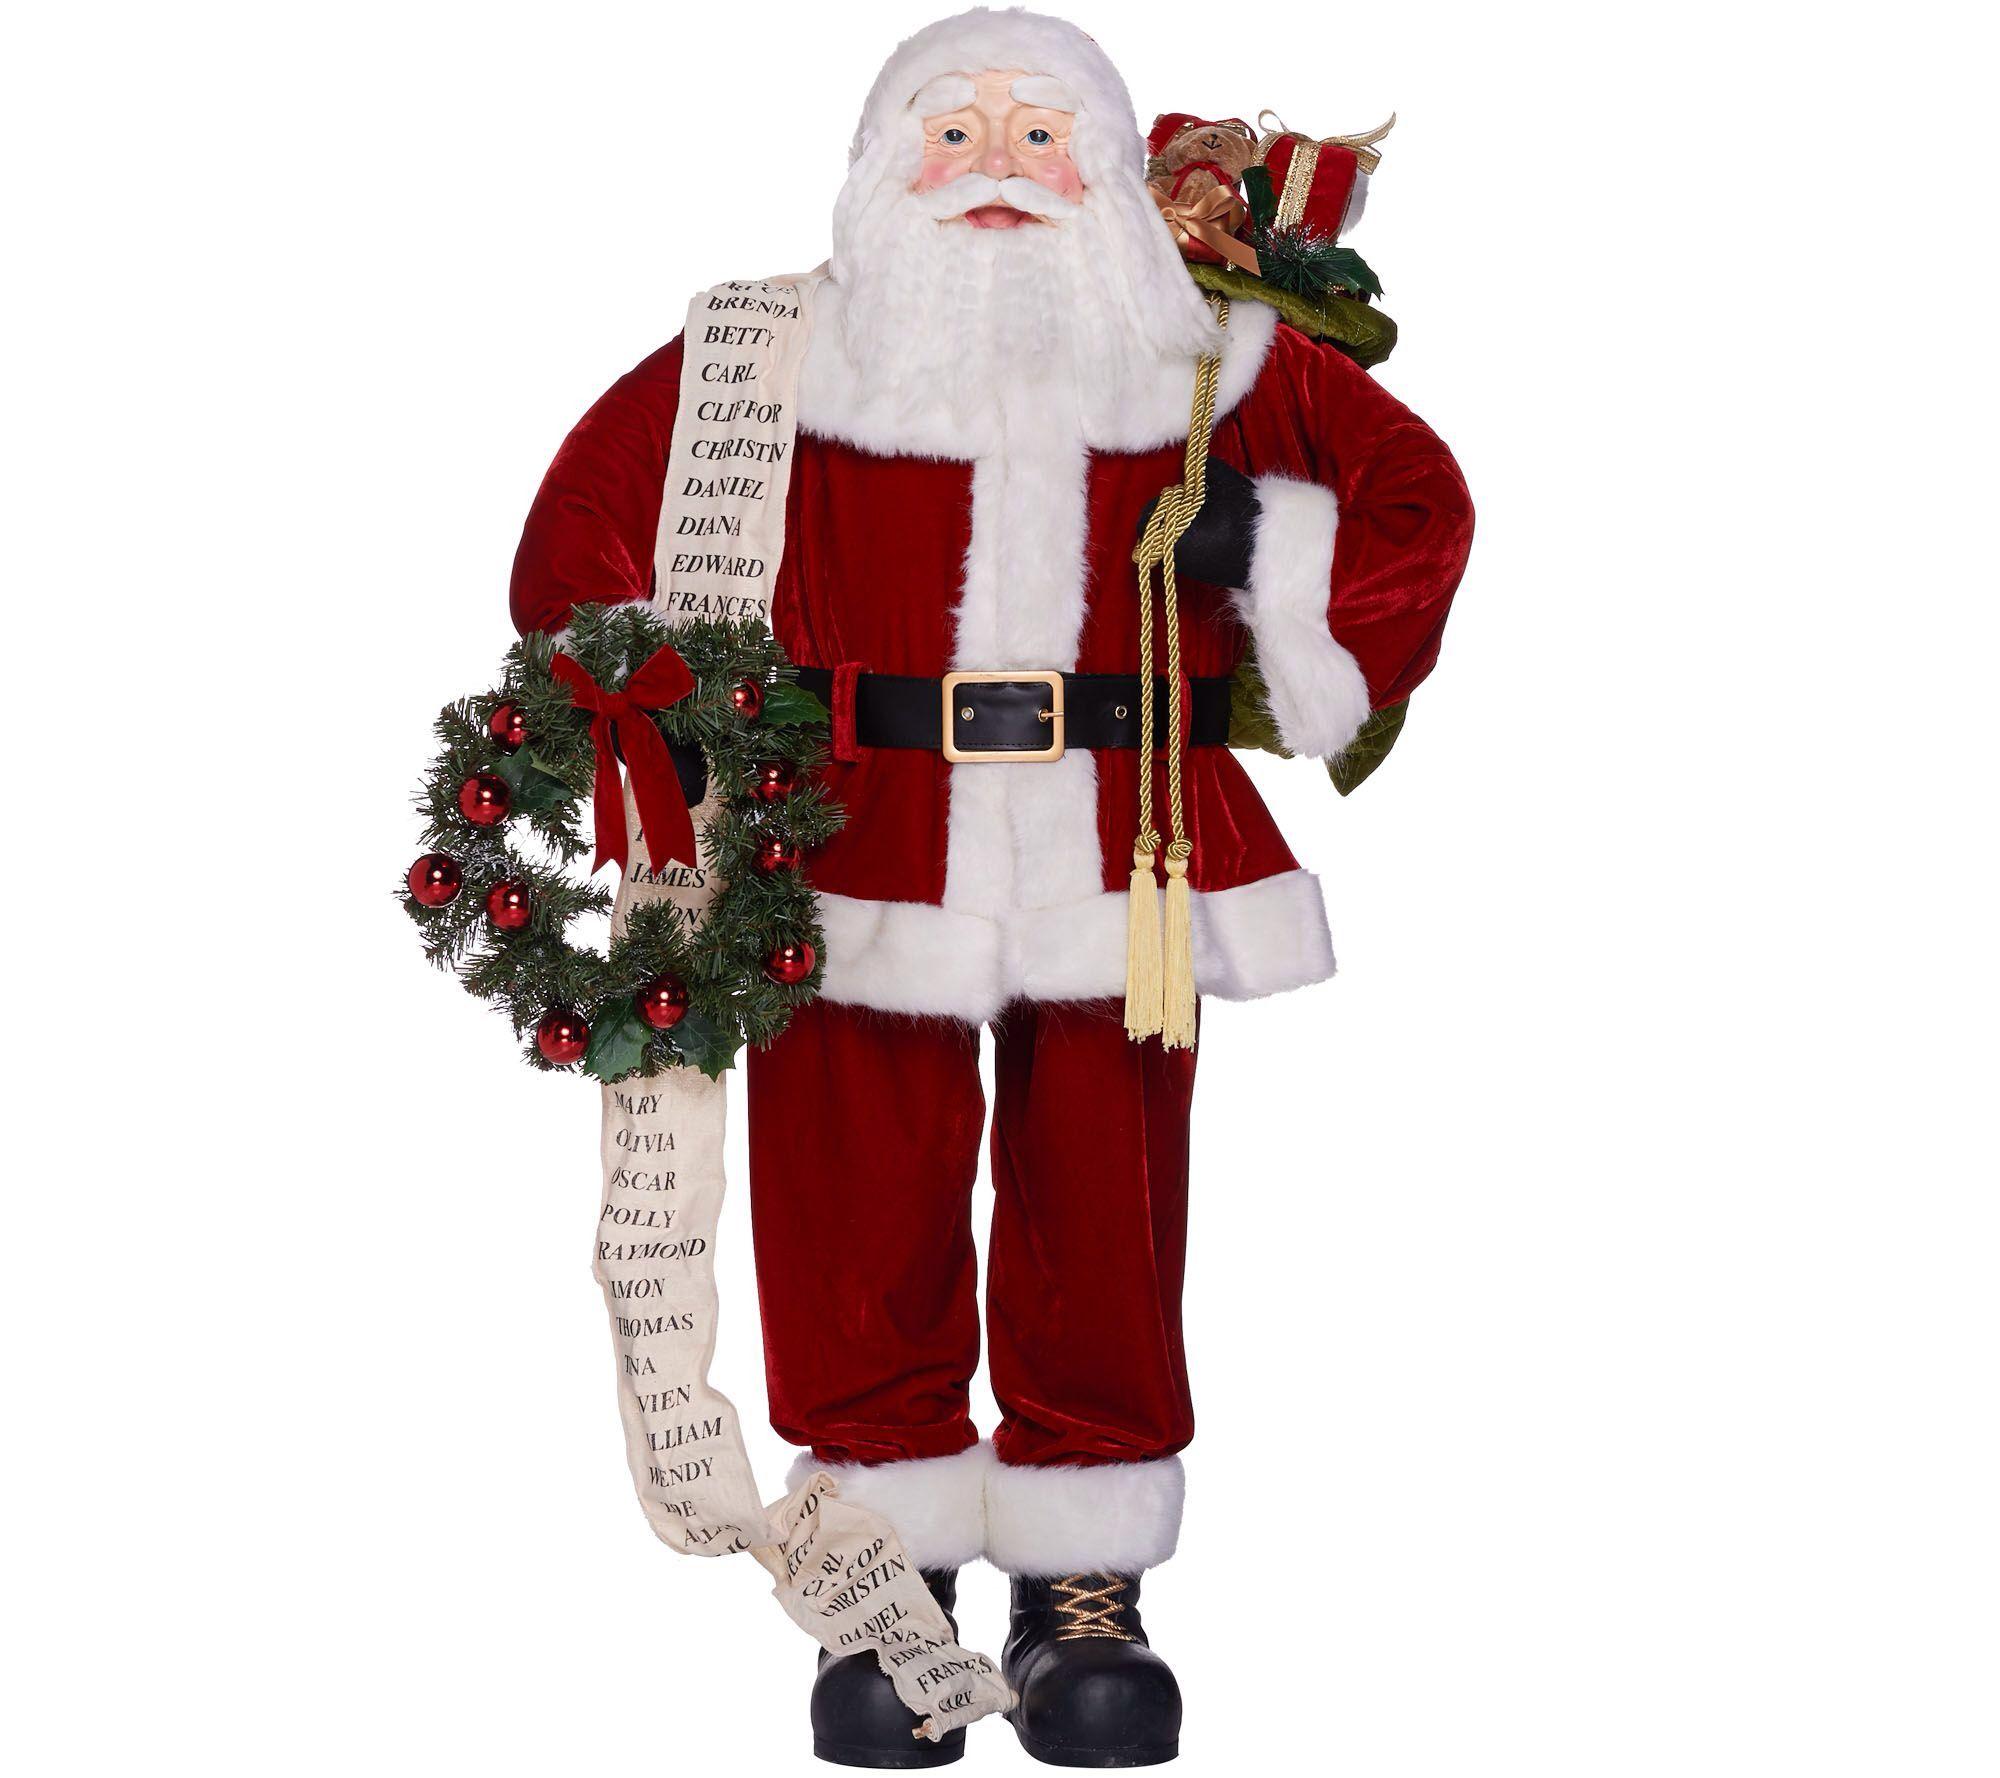 Flying santa fibre optic christmas decoration - Flying Santa Fibre Optic Christmas Decoration